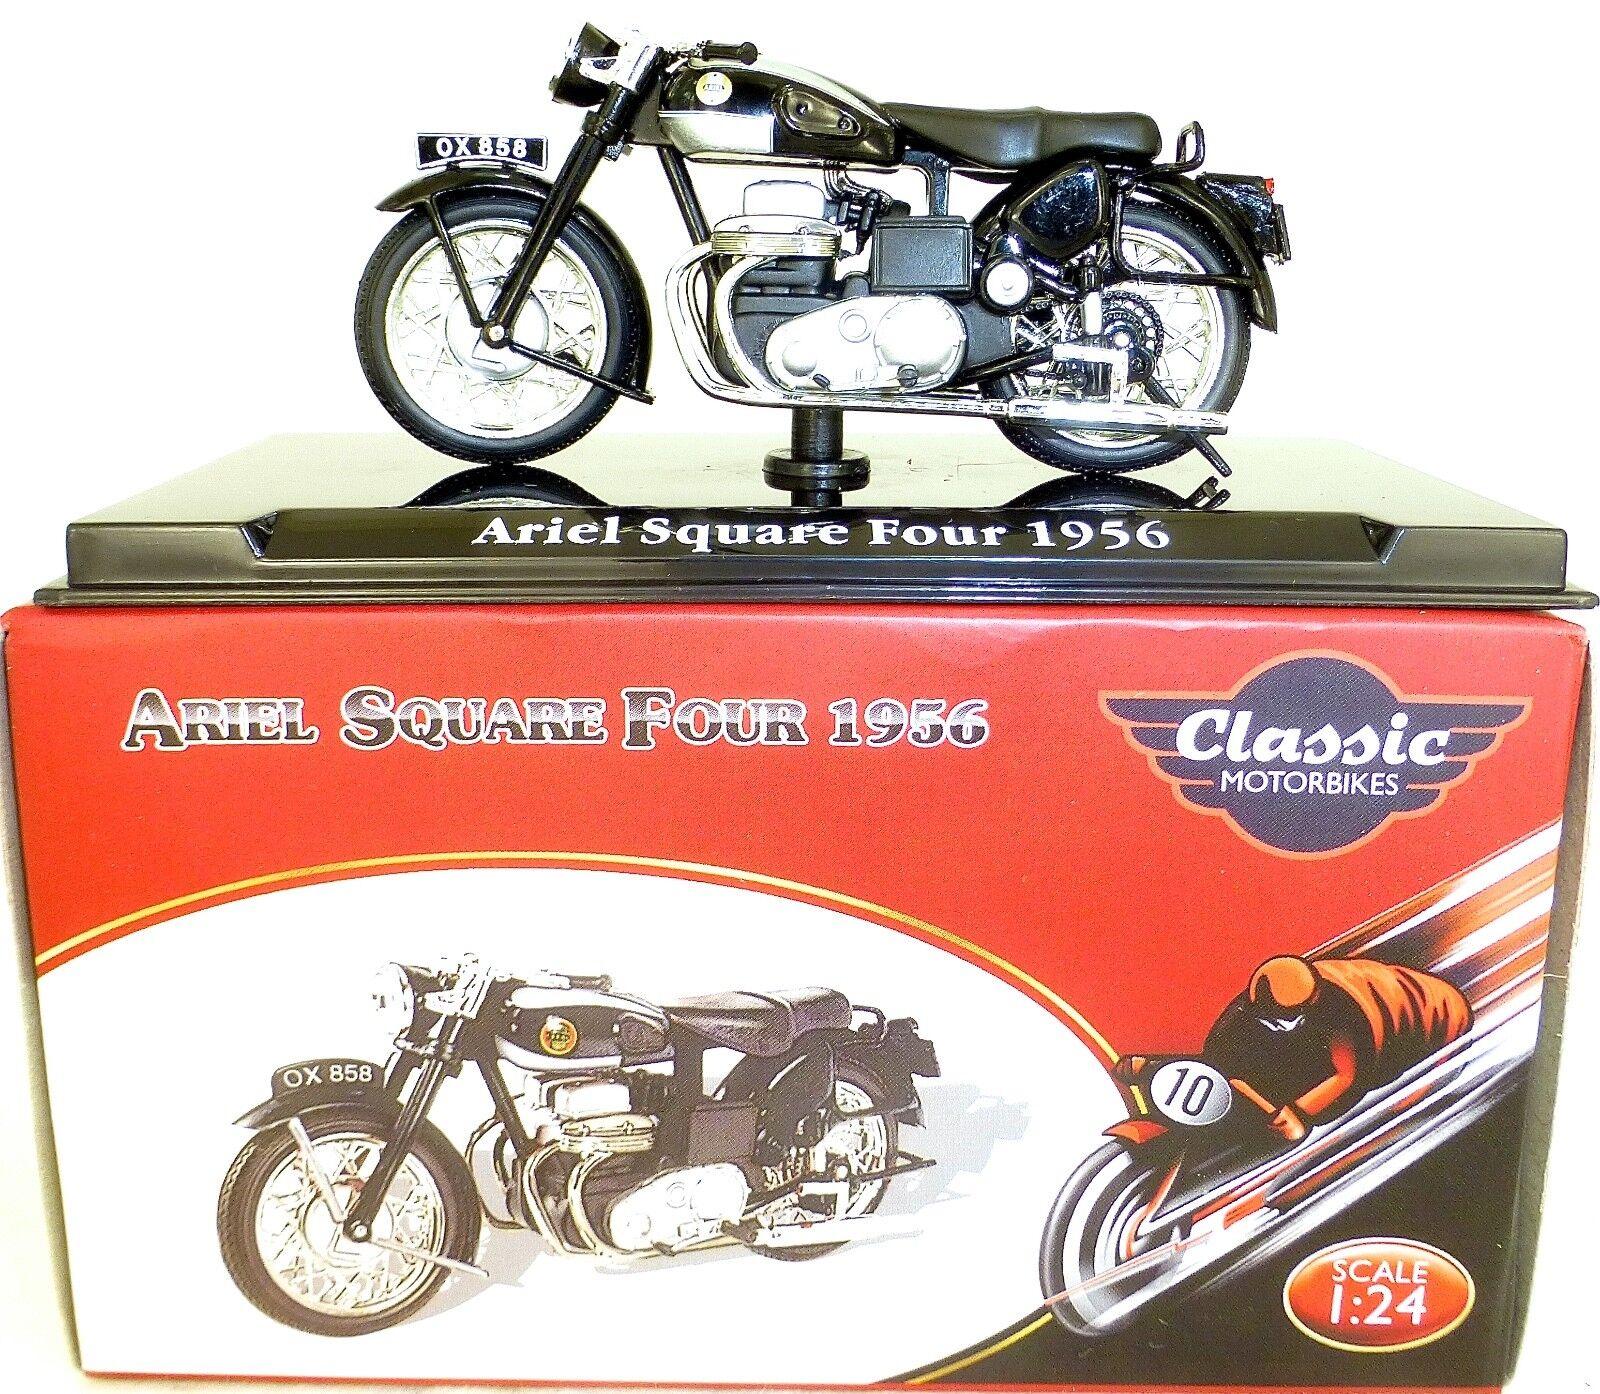 ARIEL SQUARE FOUR 1956 Motorcycle Classic Atlas 4658114 Neu 1 24 OVP HC3 µ